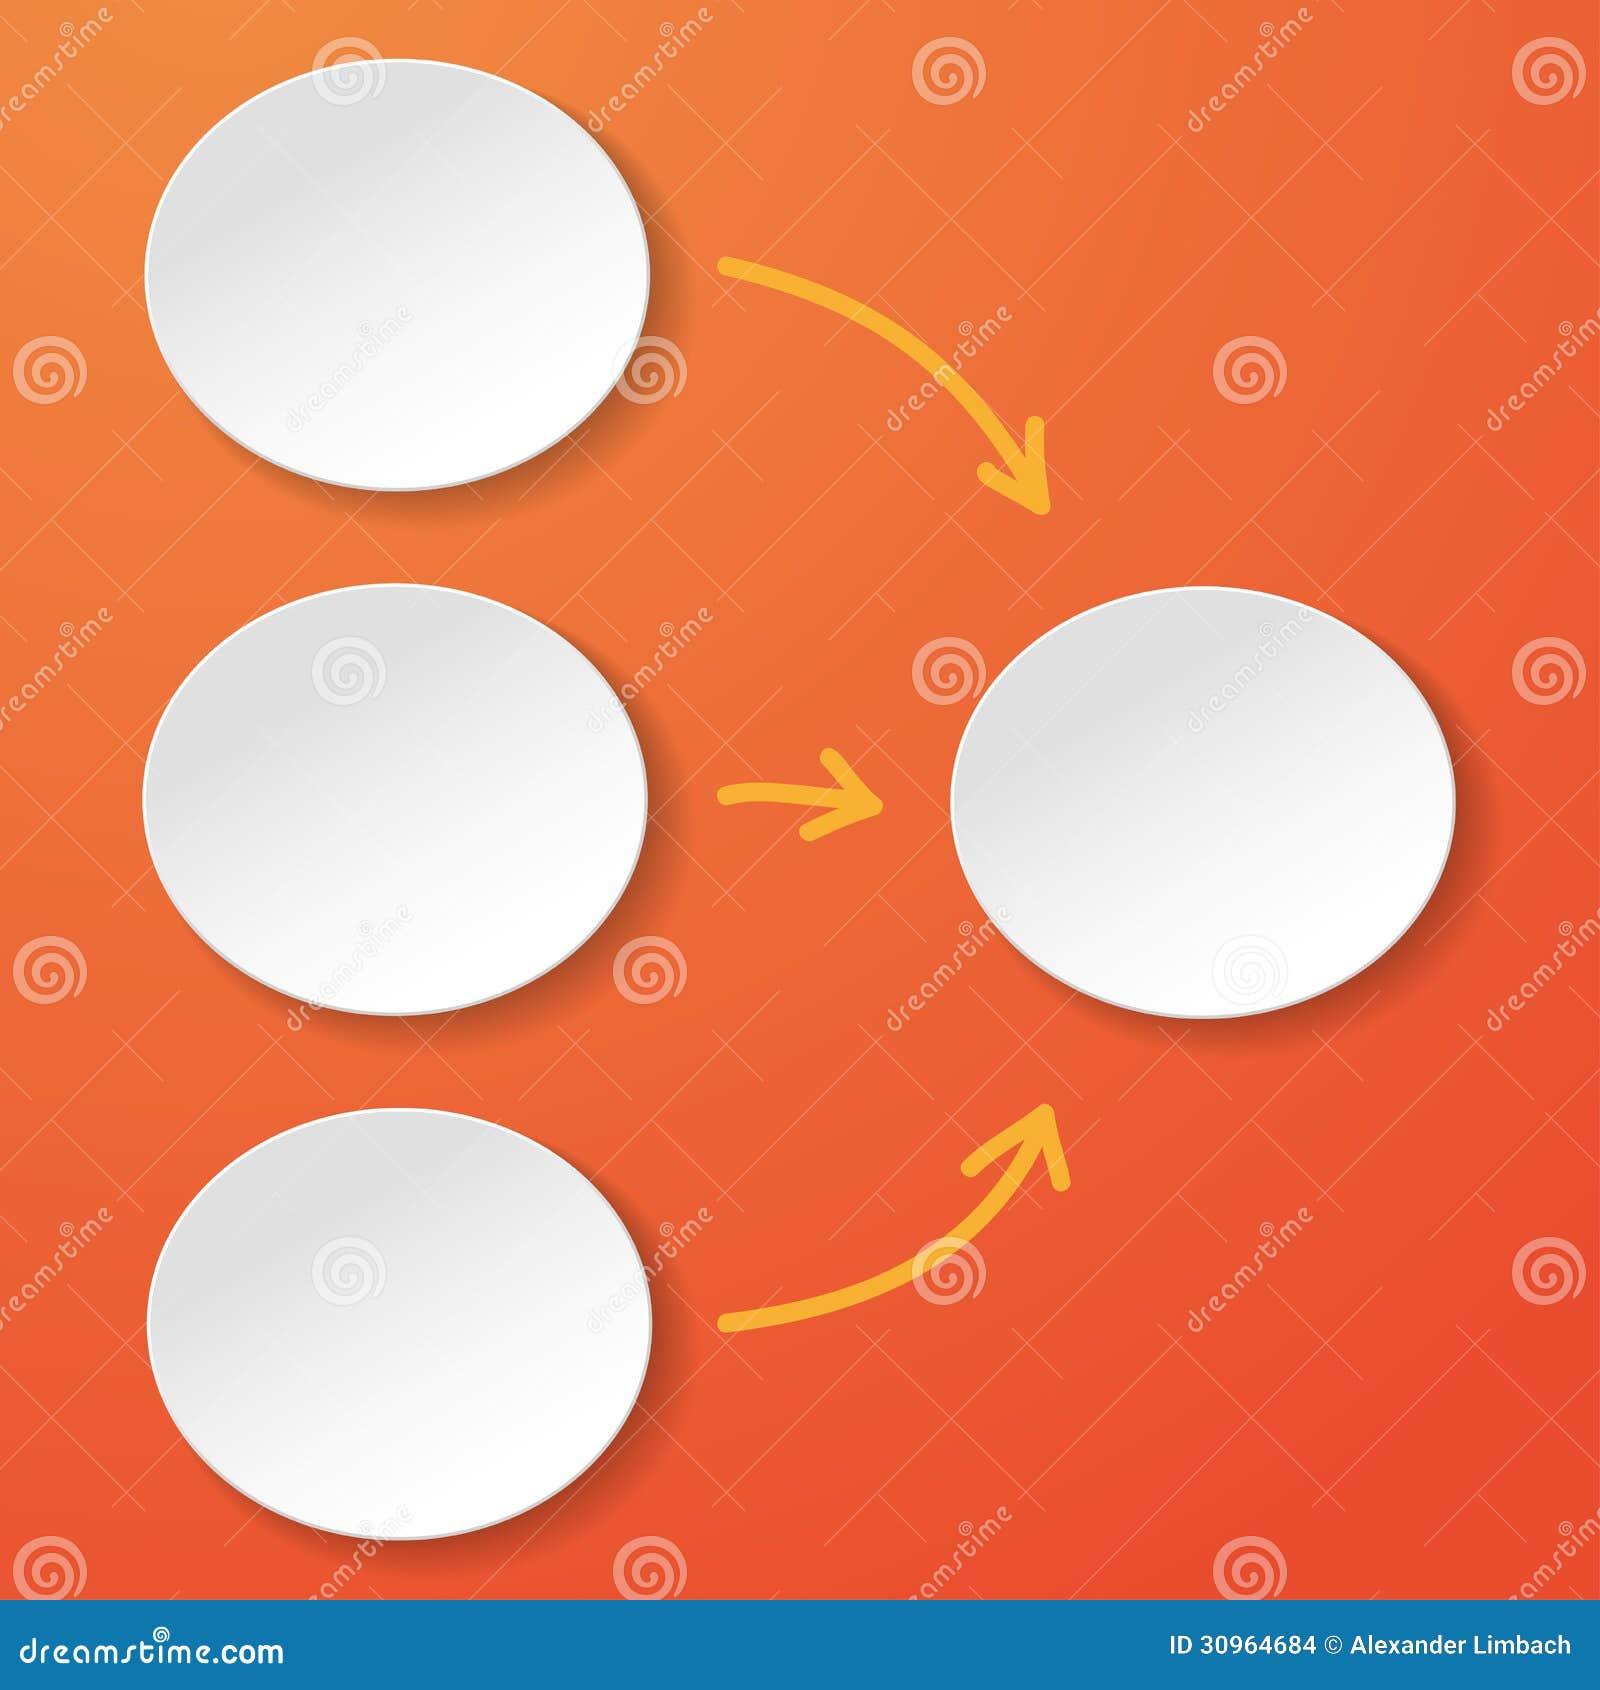 Empty flowchart oval circles orange background stock vector empty flowchart oval circles orange background nvjuhfo Gallery